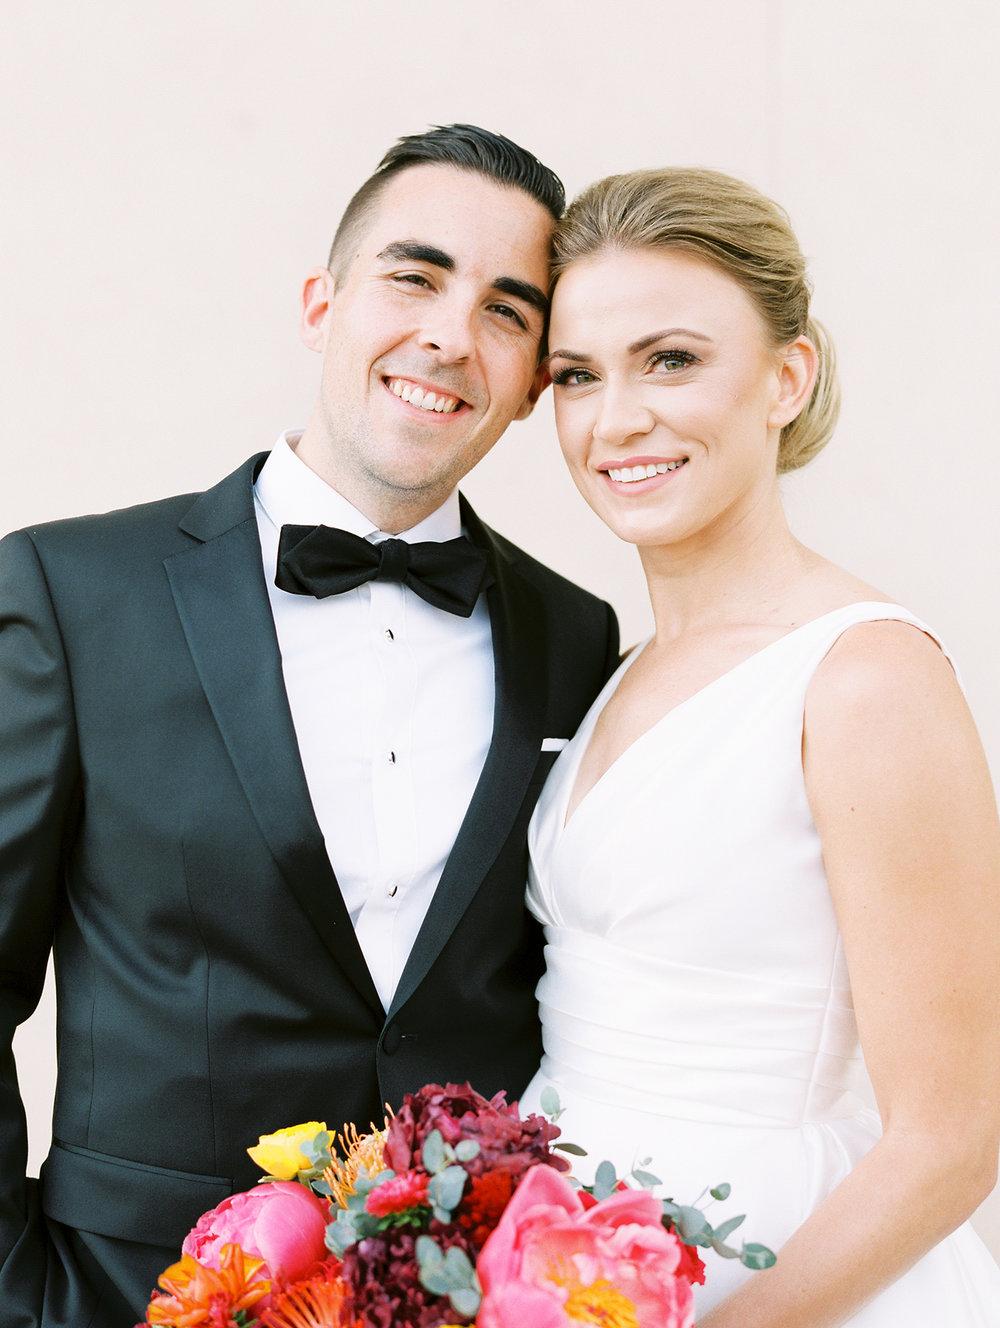 wedding-planner (4).jpg